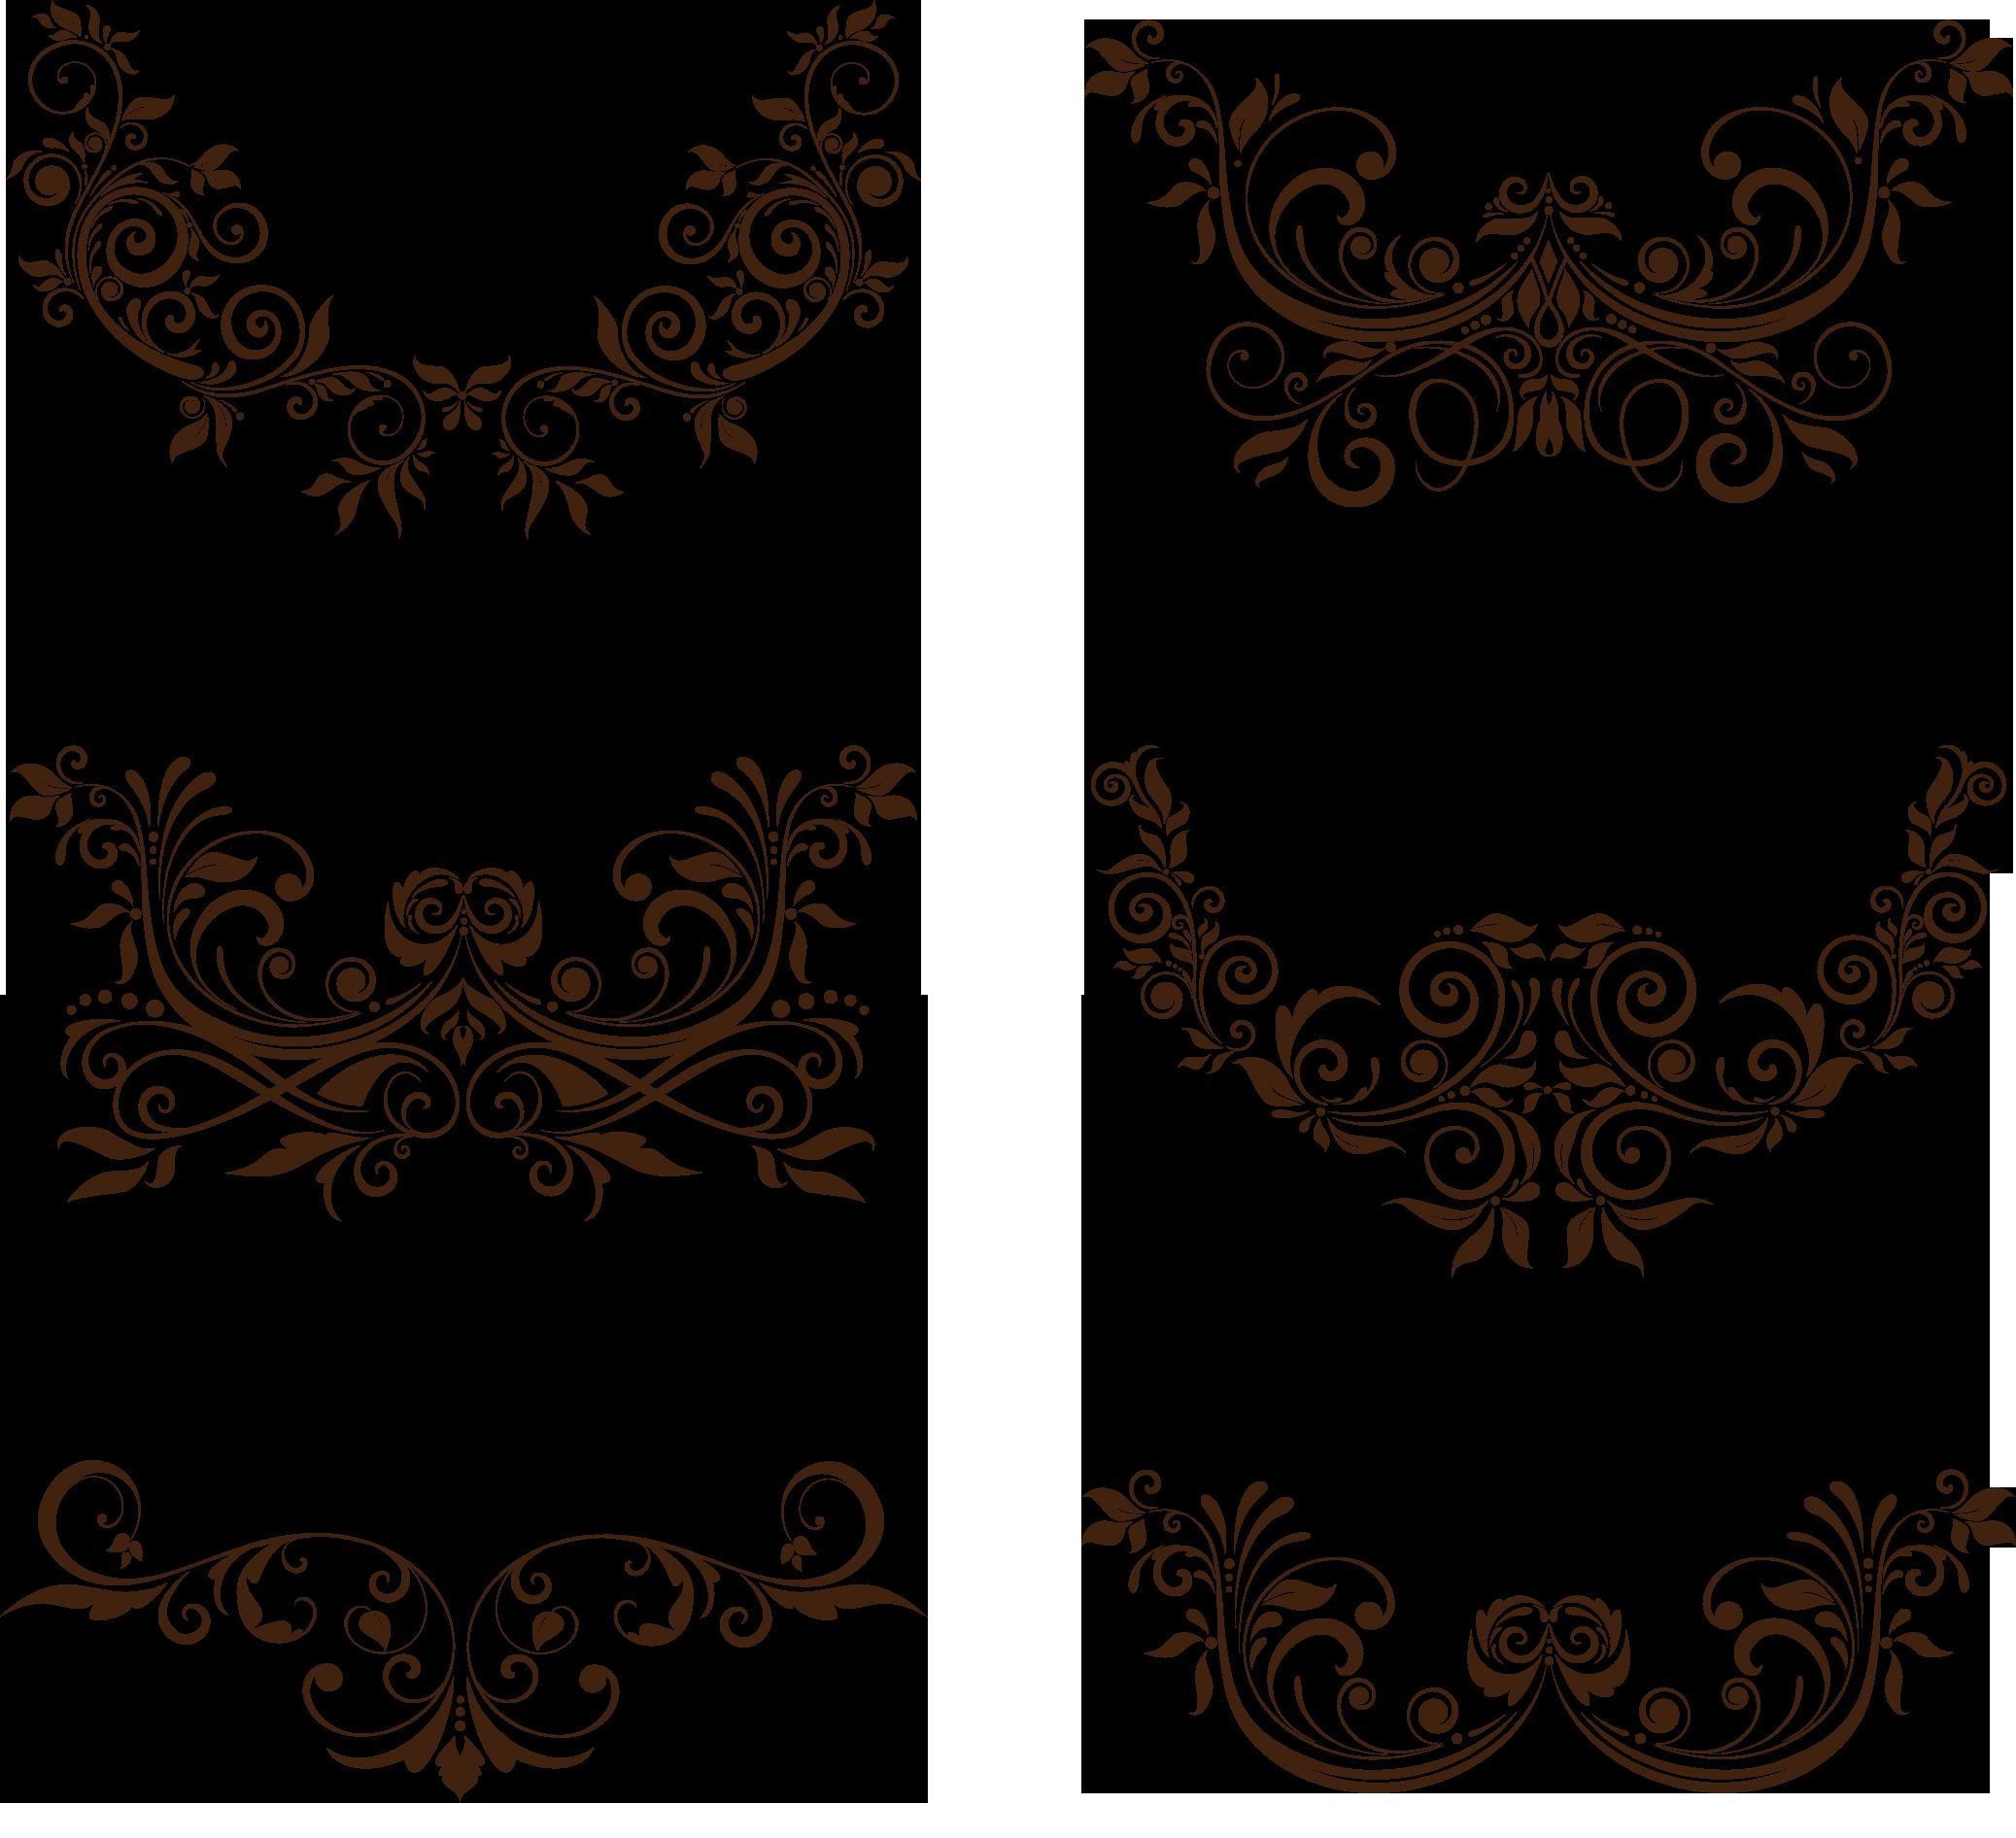 Ornament vector png. Euclidean floral transprent free